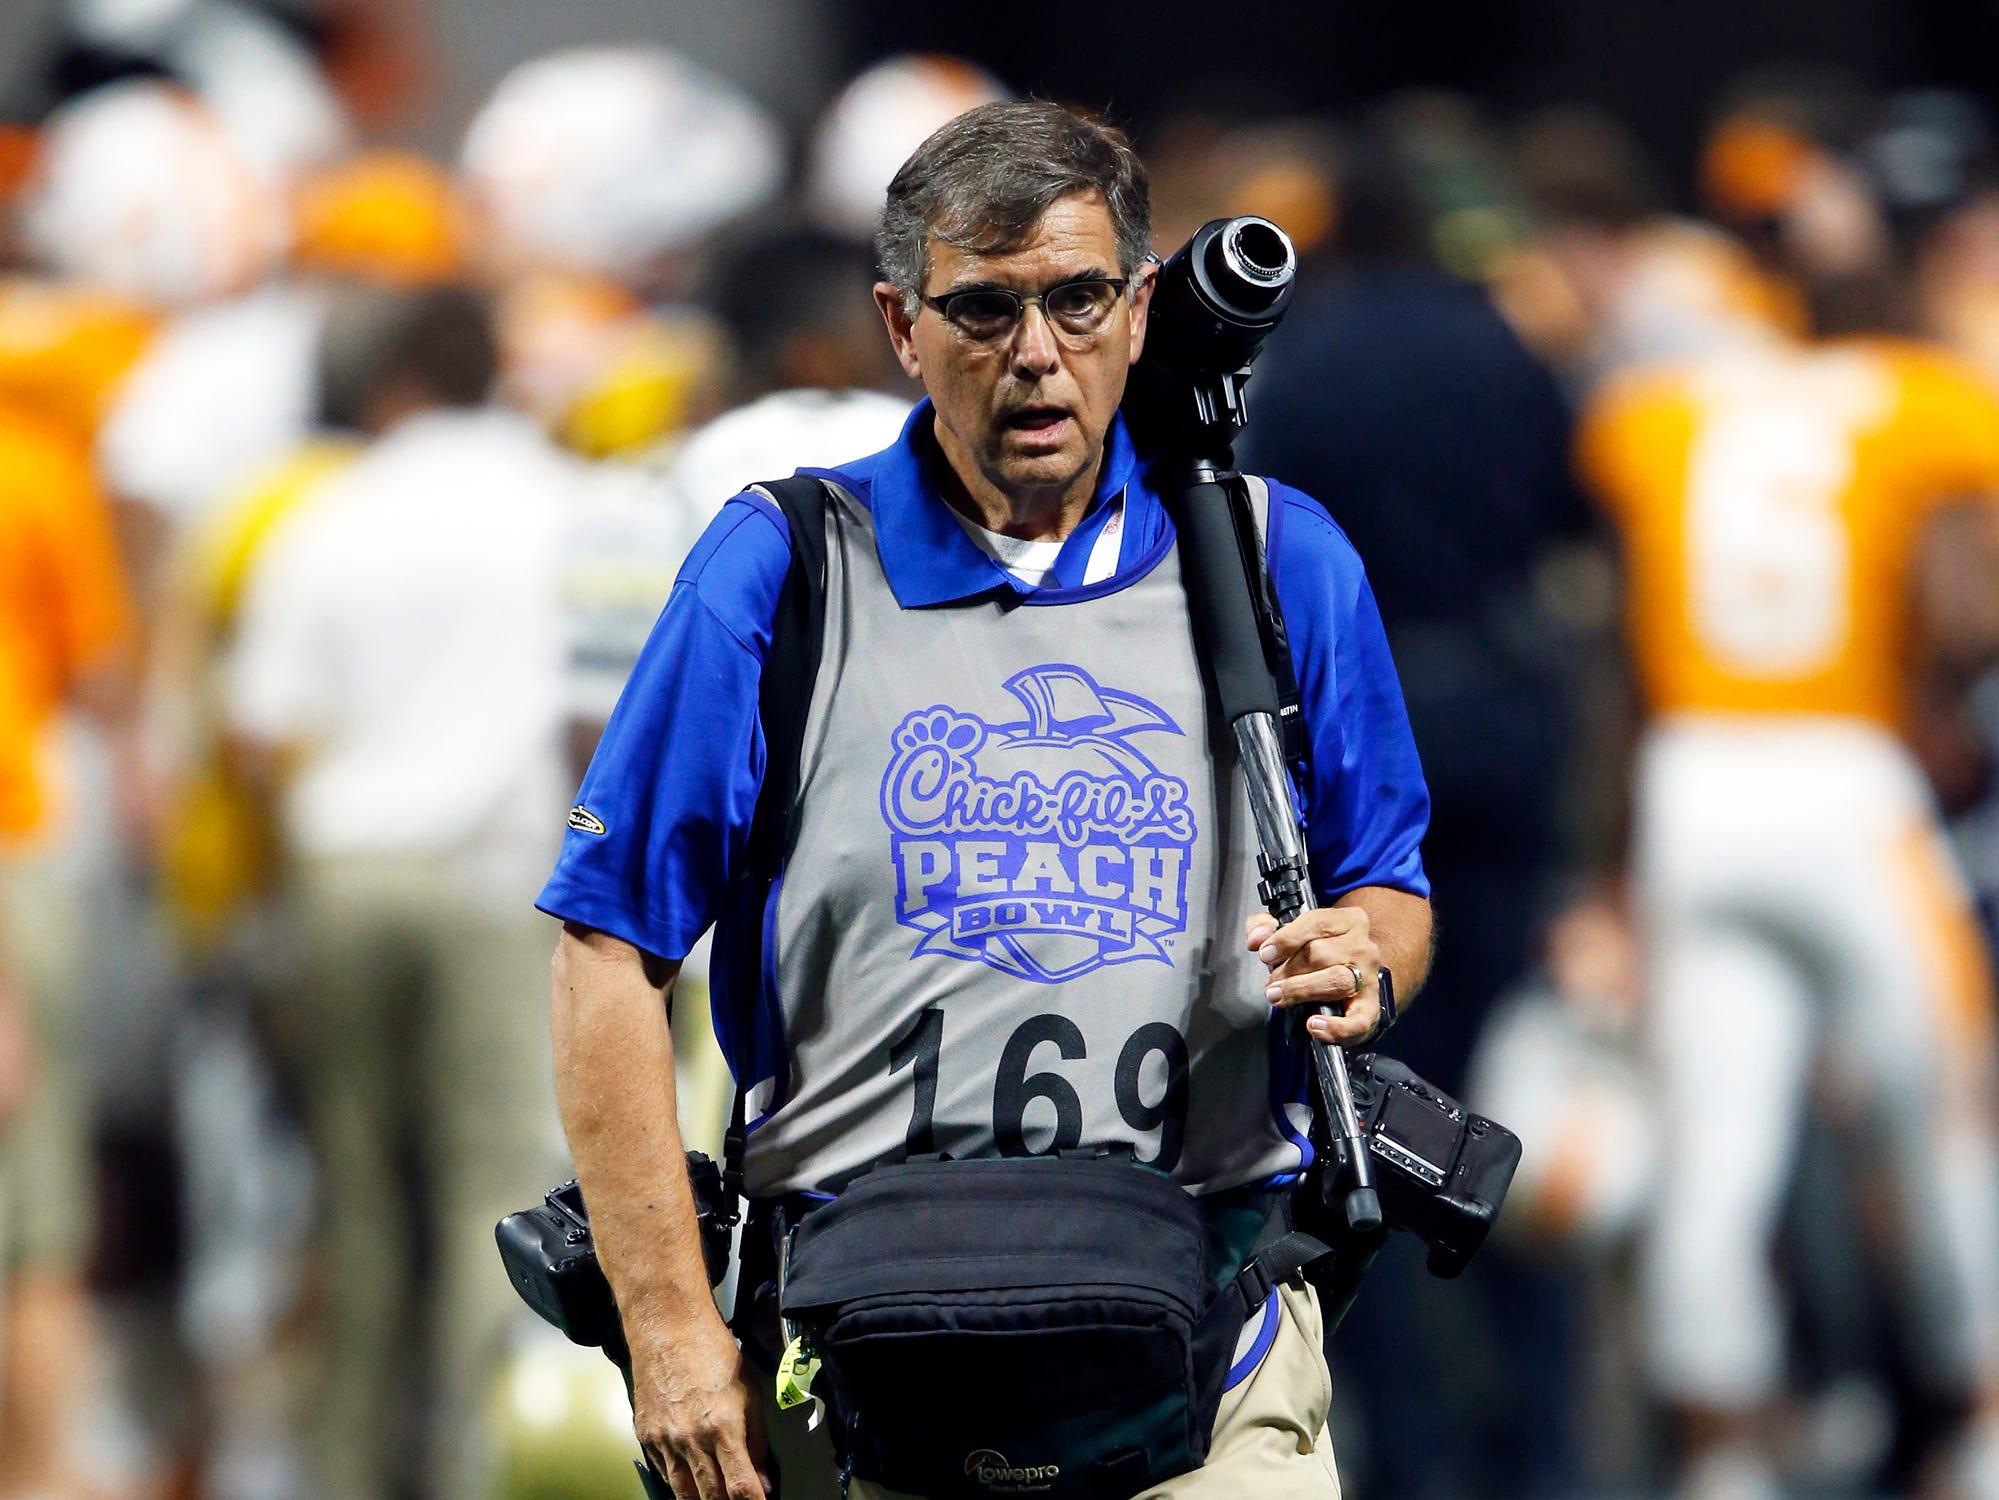 News Sentinel Senior Photojournalist during an NCAA football game Monday, Sept. 4, 2017, in Atlanta, GA.